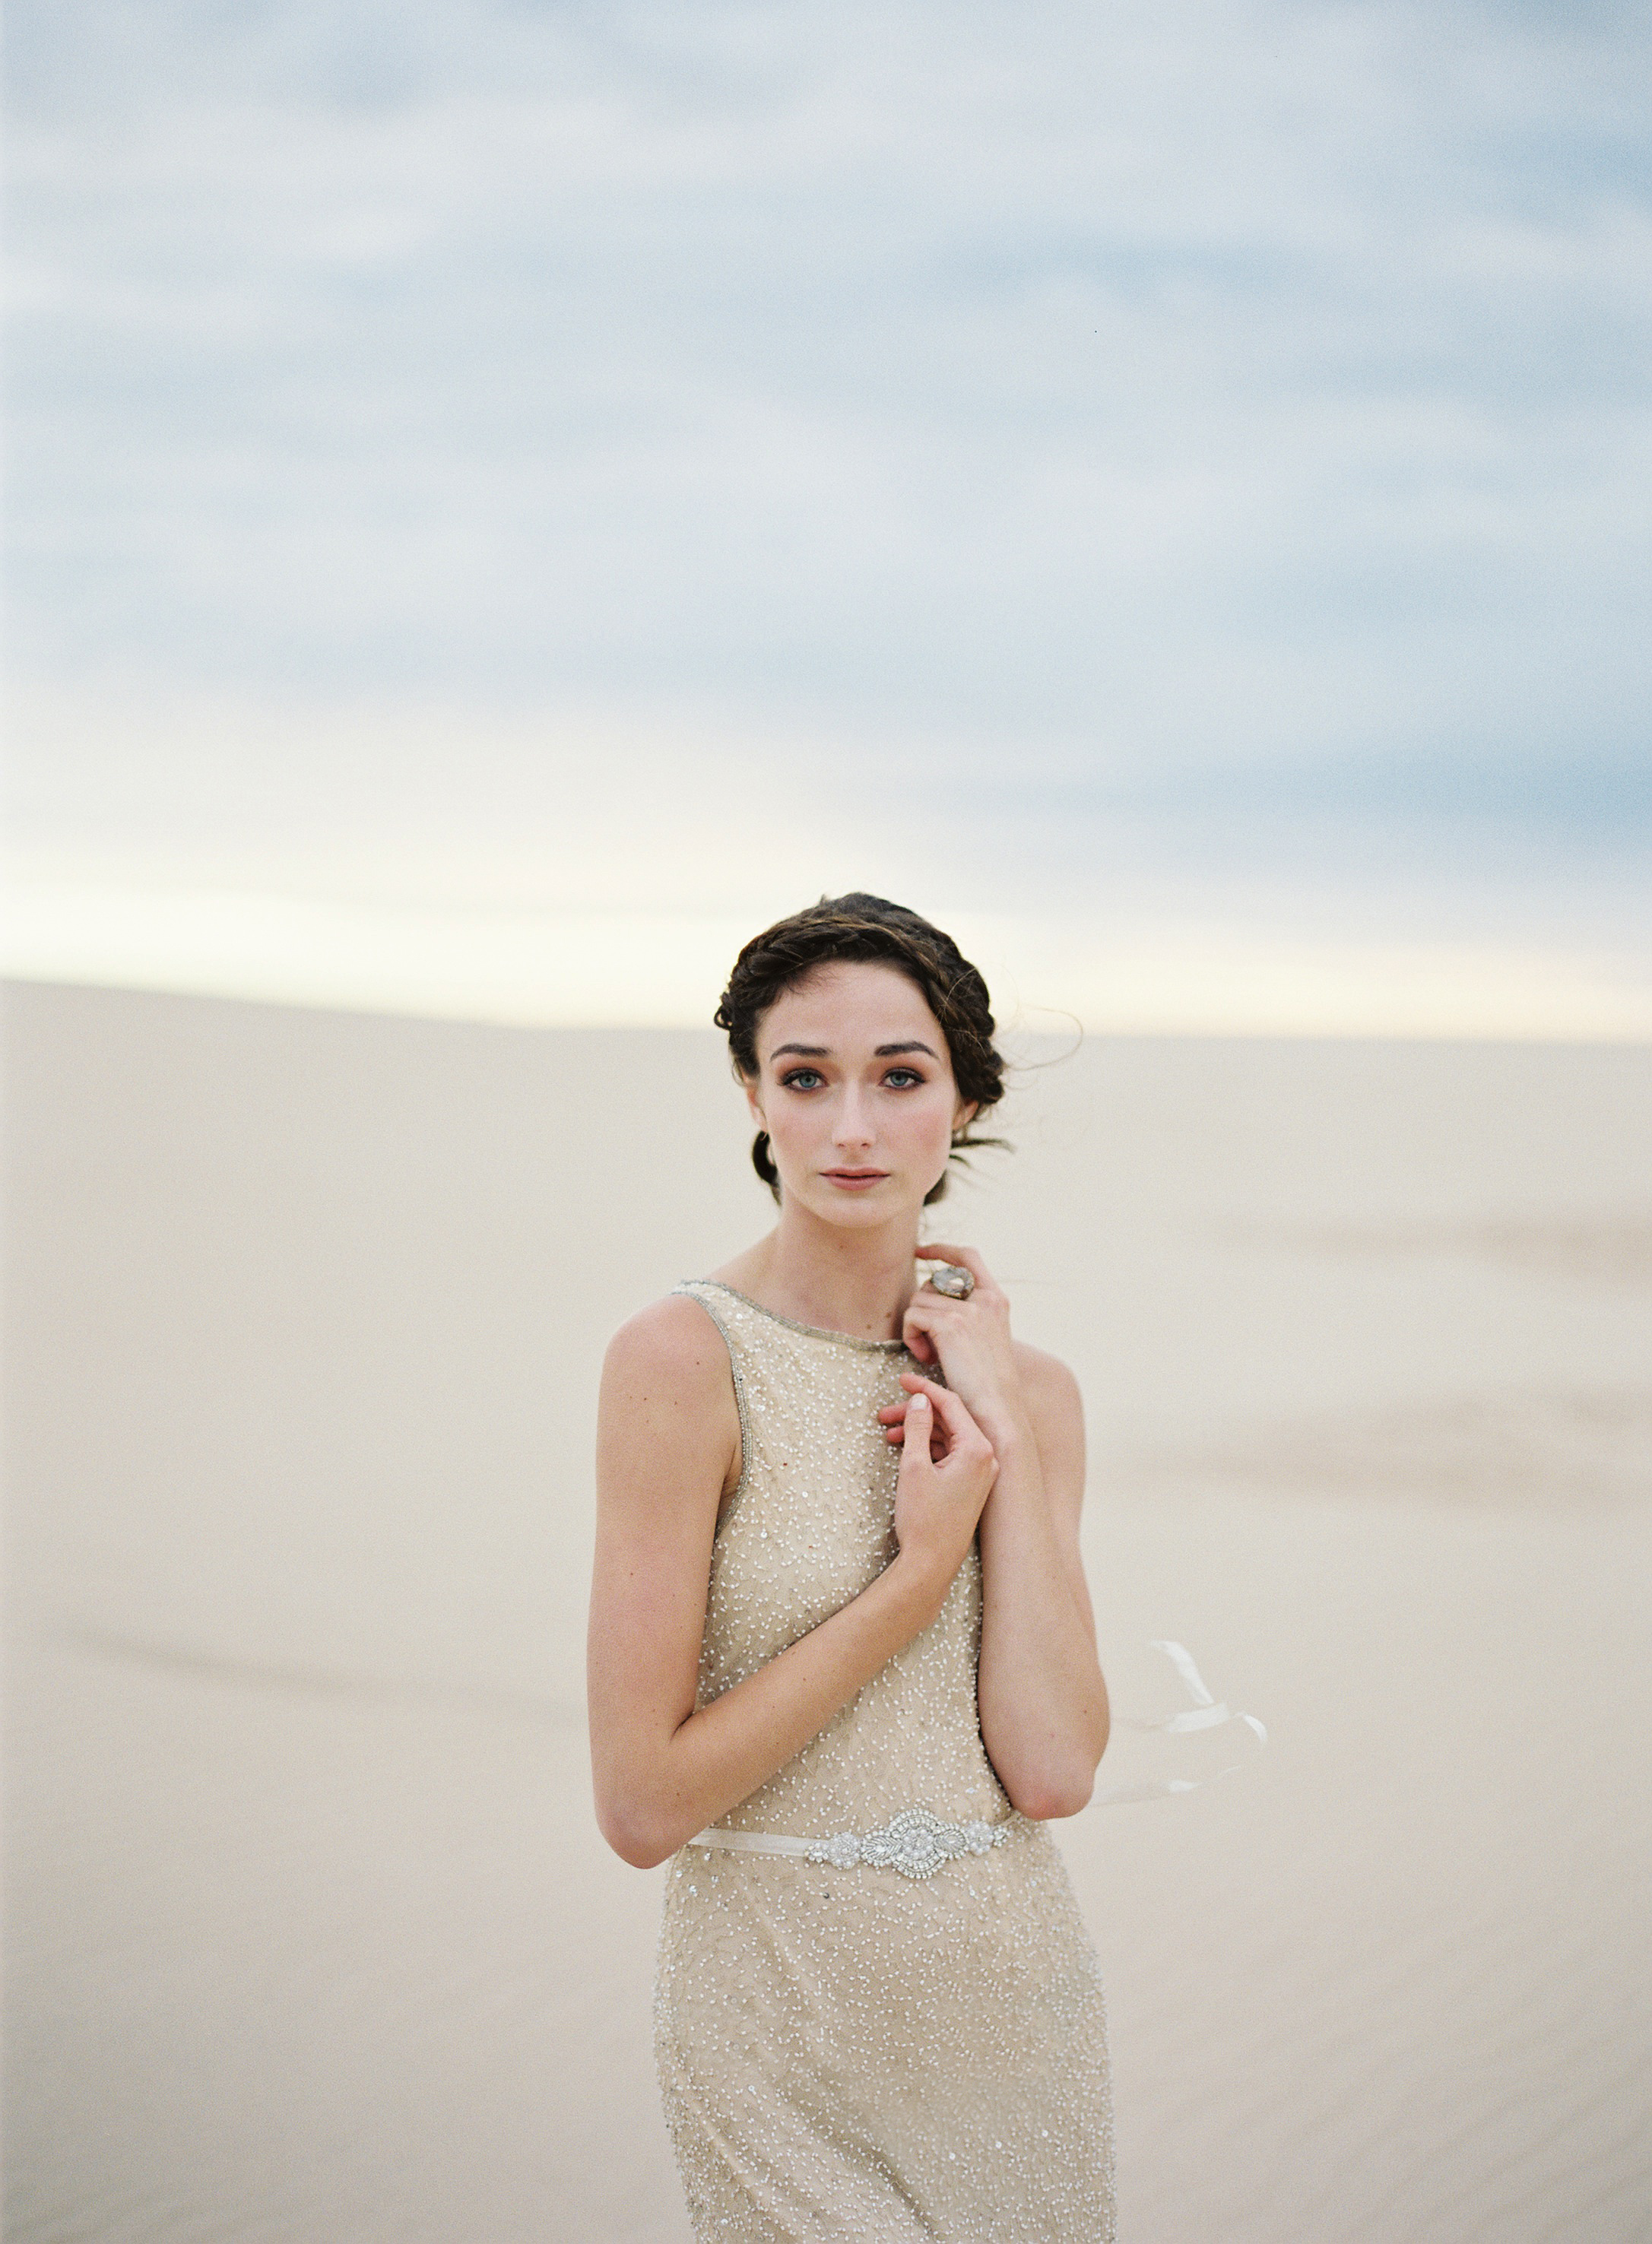 Kyle John l Fine Art Wedding Photography l Chicago, Copenhagen, California, New York, Destination l Blog l Millicent_18